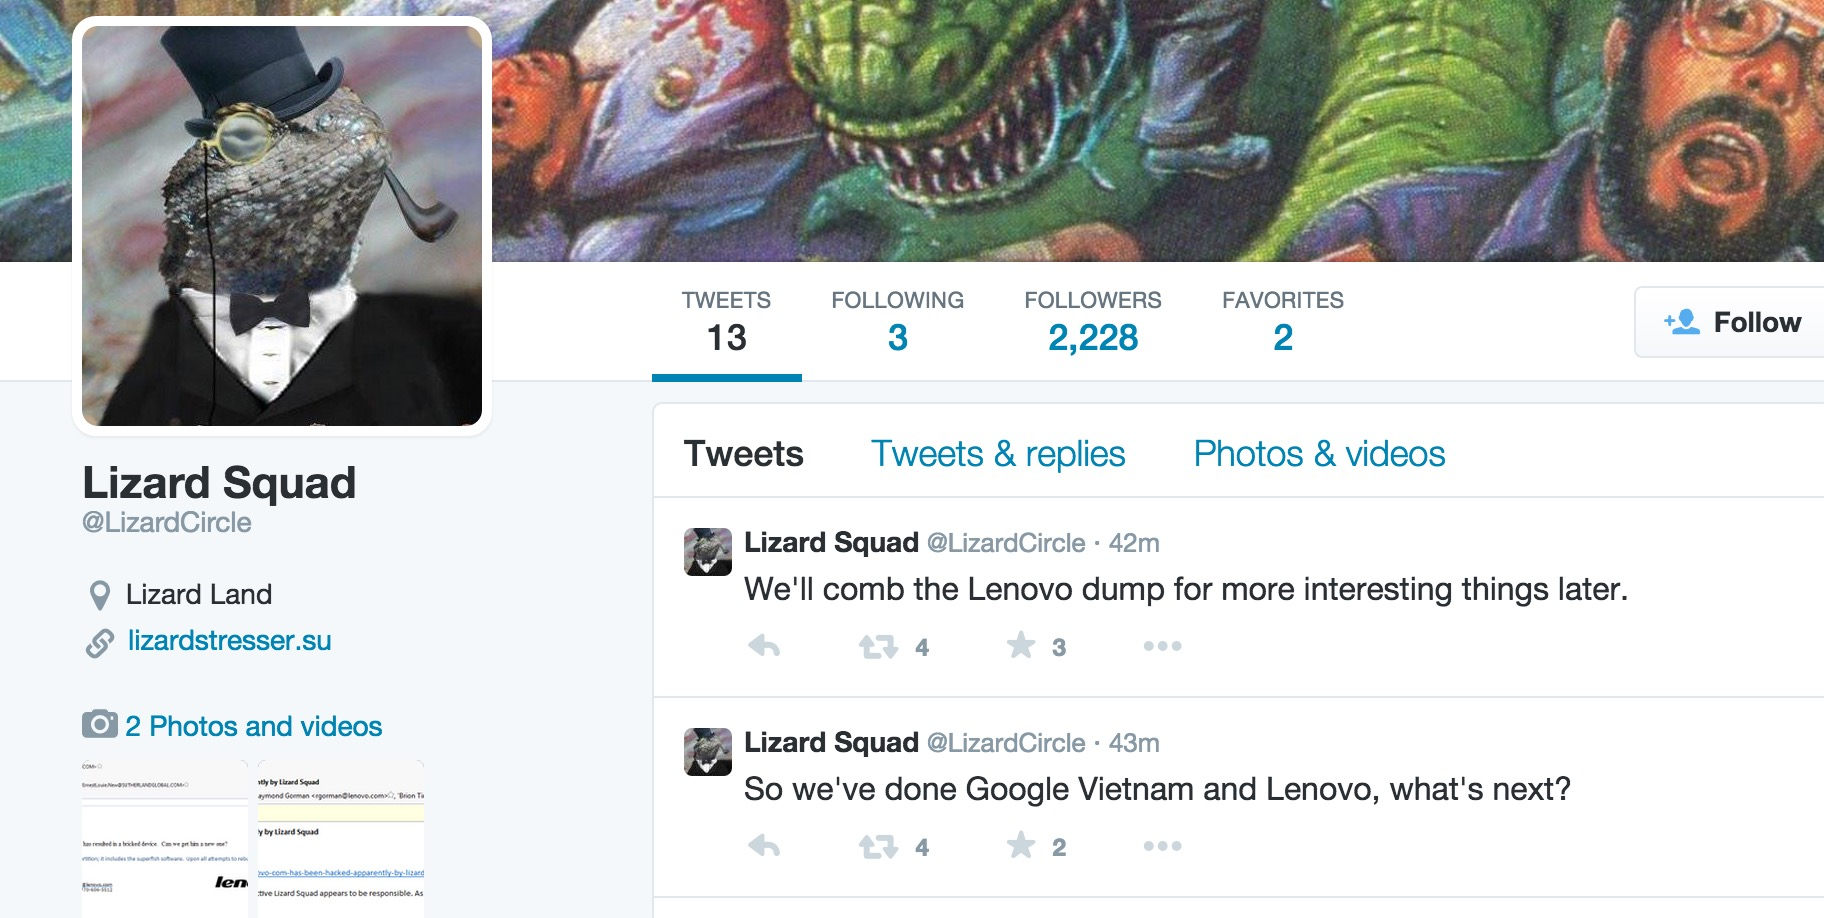 lenovo_lizard_squad_hack_tinhte.vn.jpg